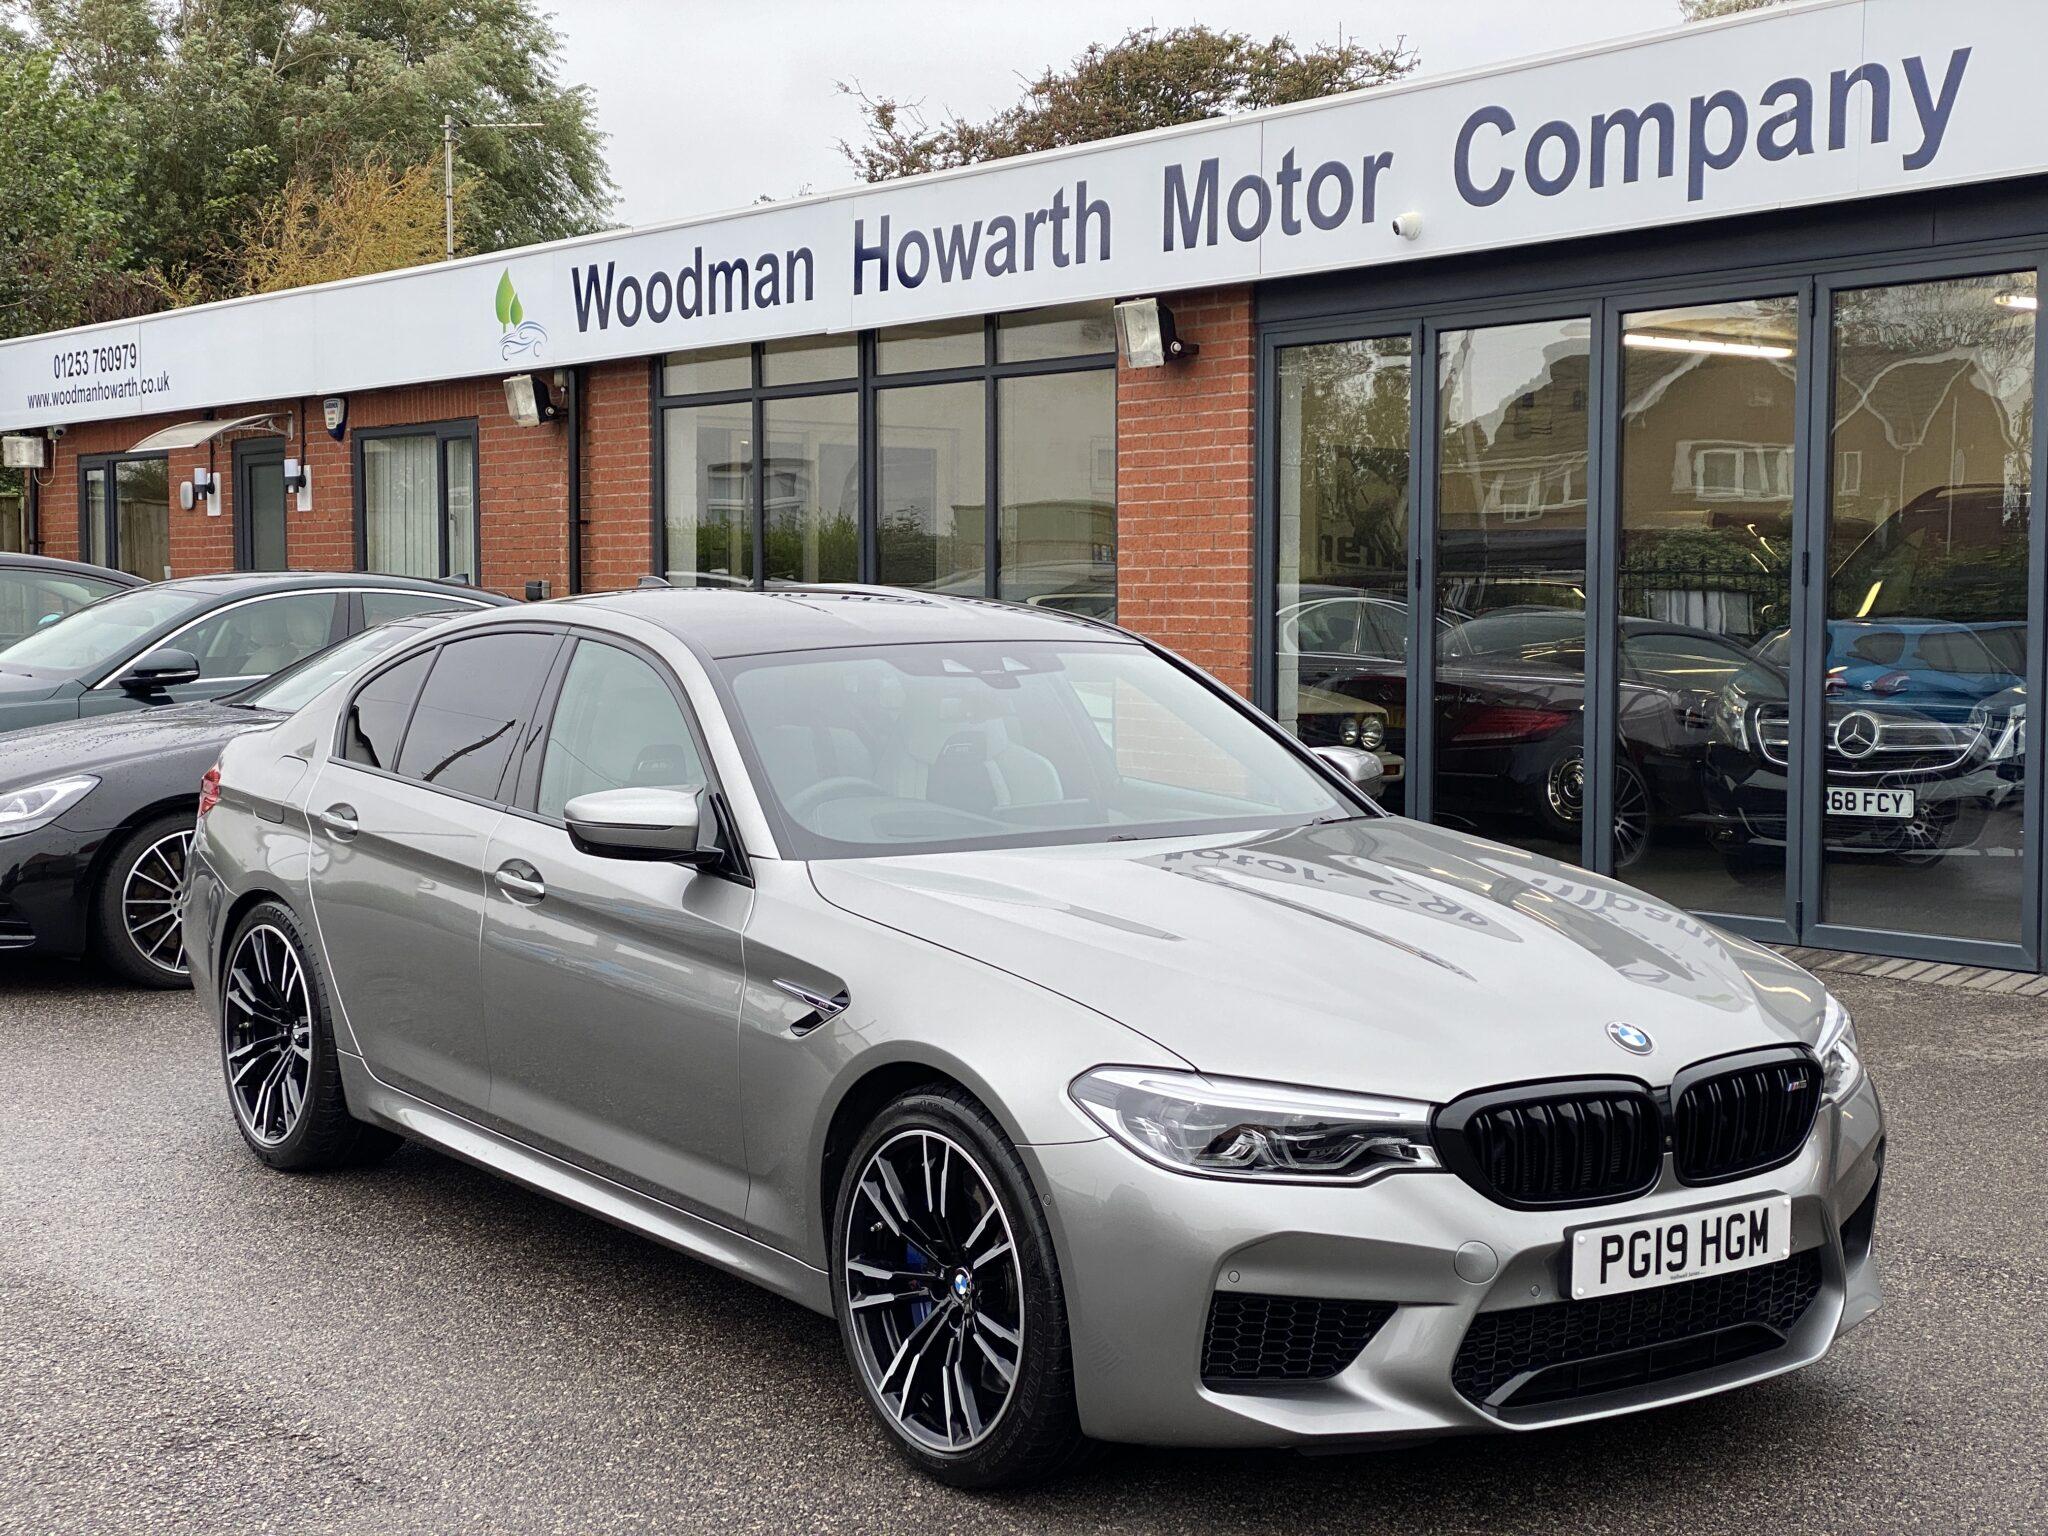 2019 19 BMW M5 4.4 V8 XDRIVE SALOON 600 BHP Comfort Pack High Spec Low Miles Pristine